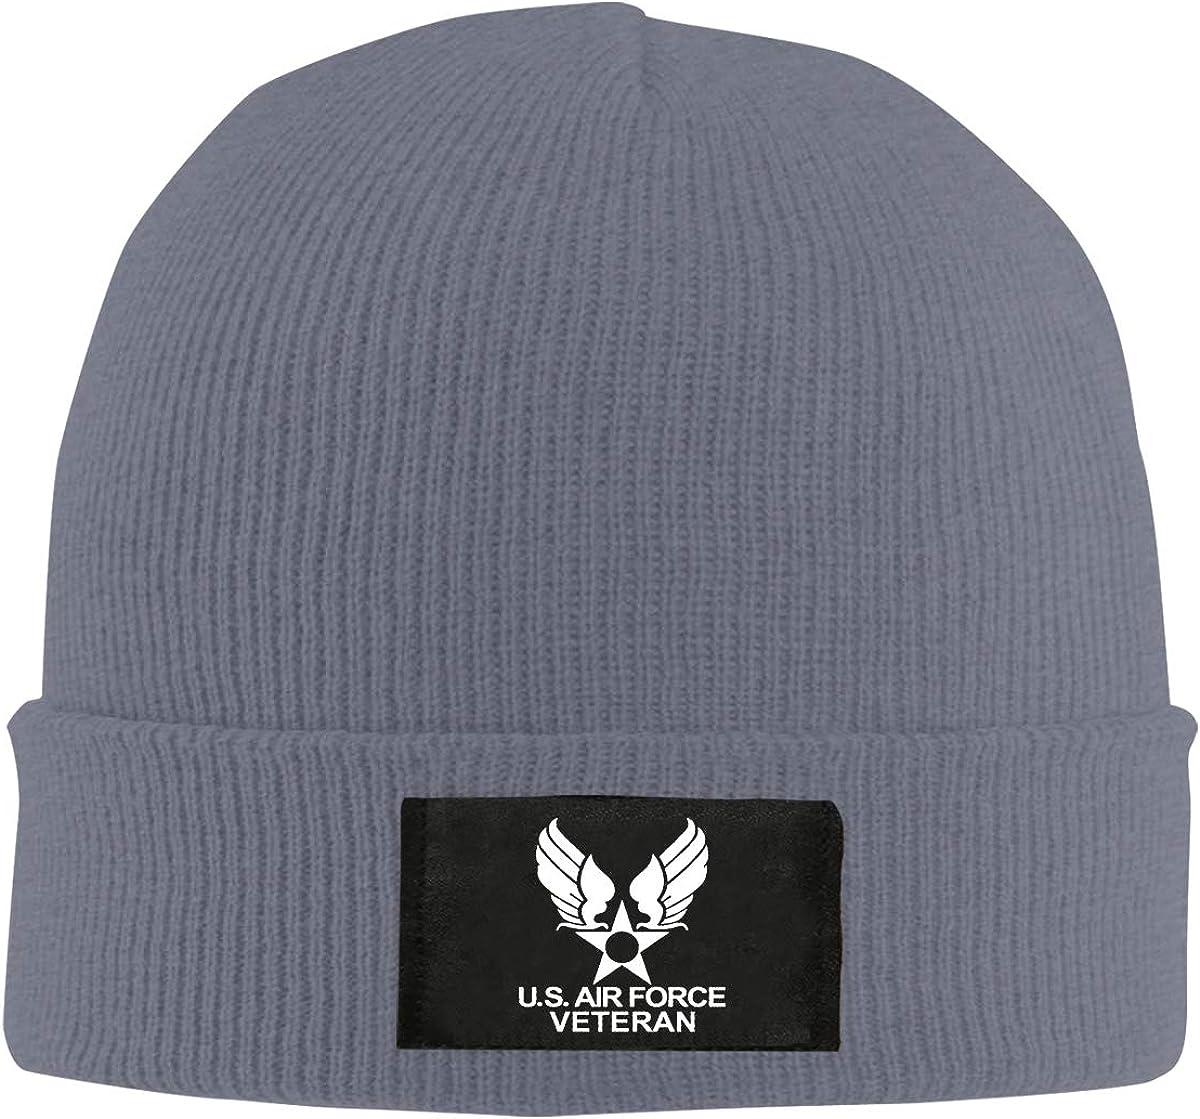 ZHIJIKNITHAT US Air Force Veteran Unisex Warm Be Washington Mall Knit Special sale item Hat Winter